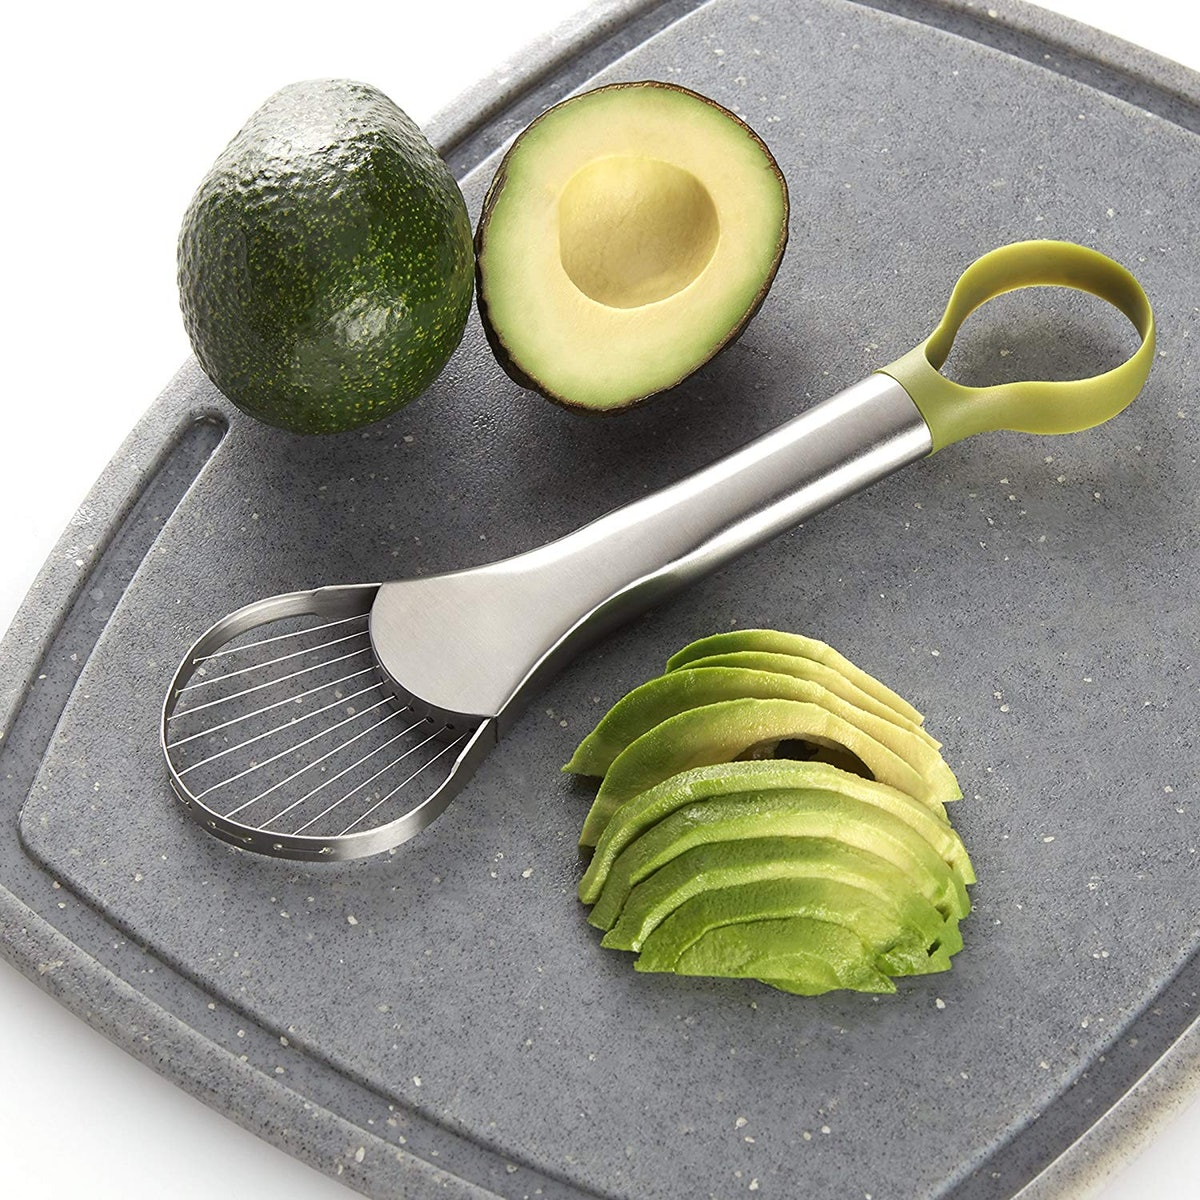 Amco Avocado Slicer And Pitter